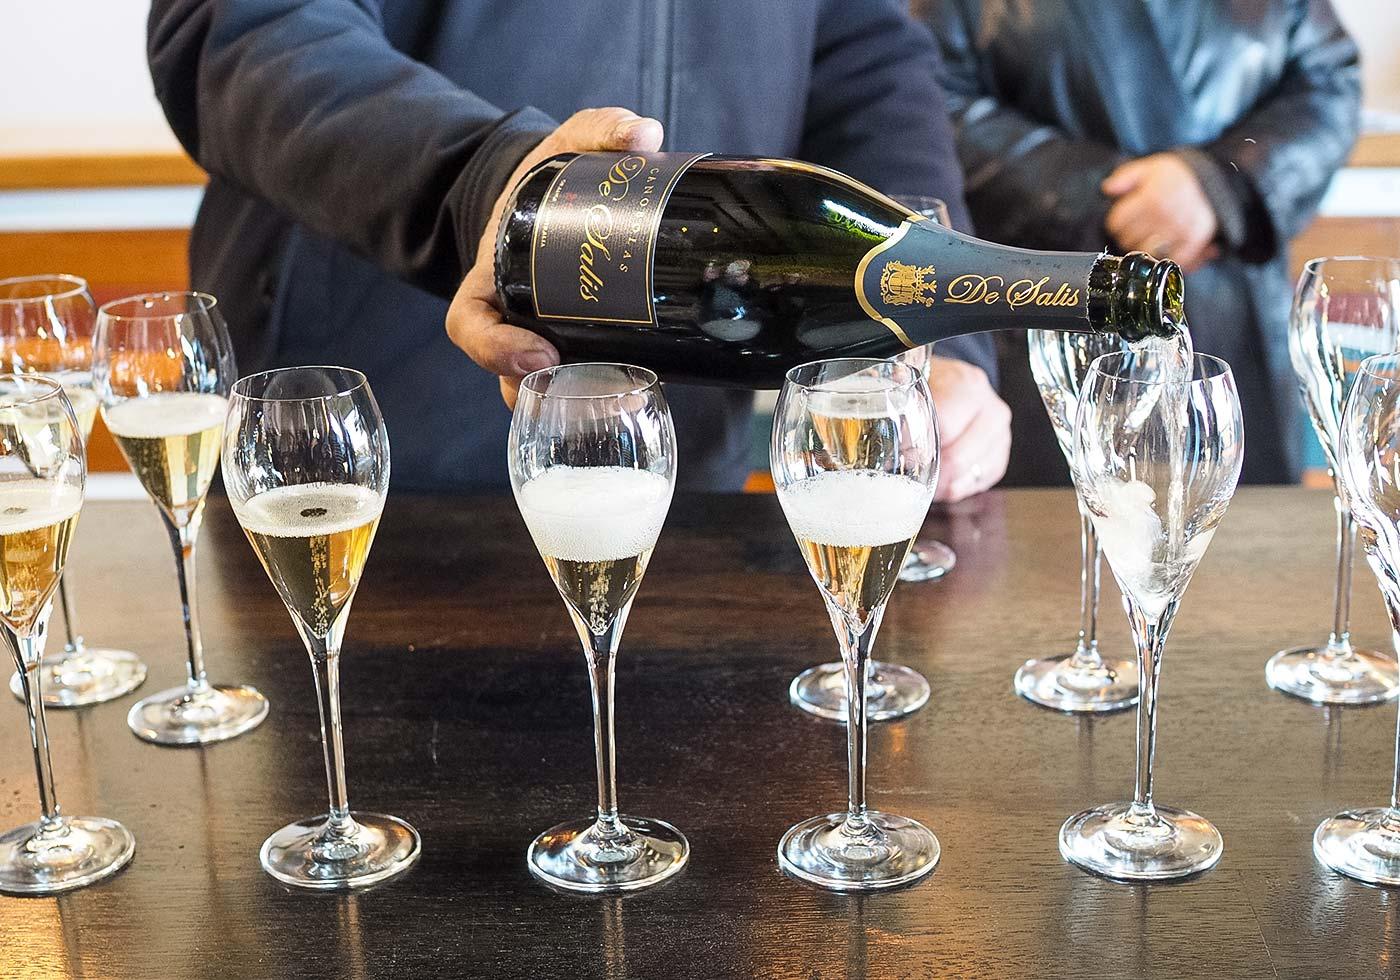 de-salis-sparkling-wine